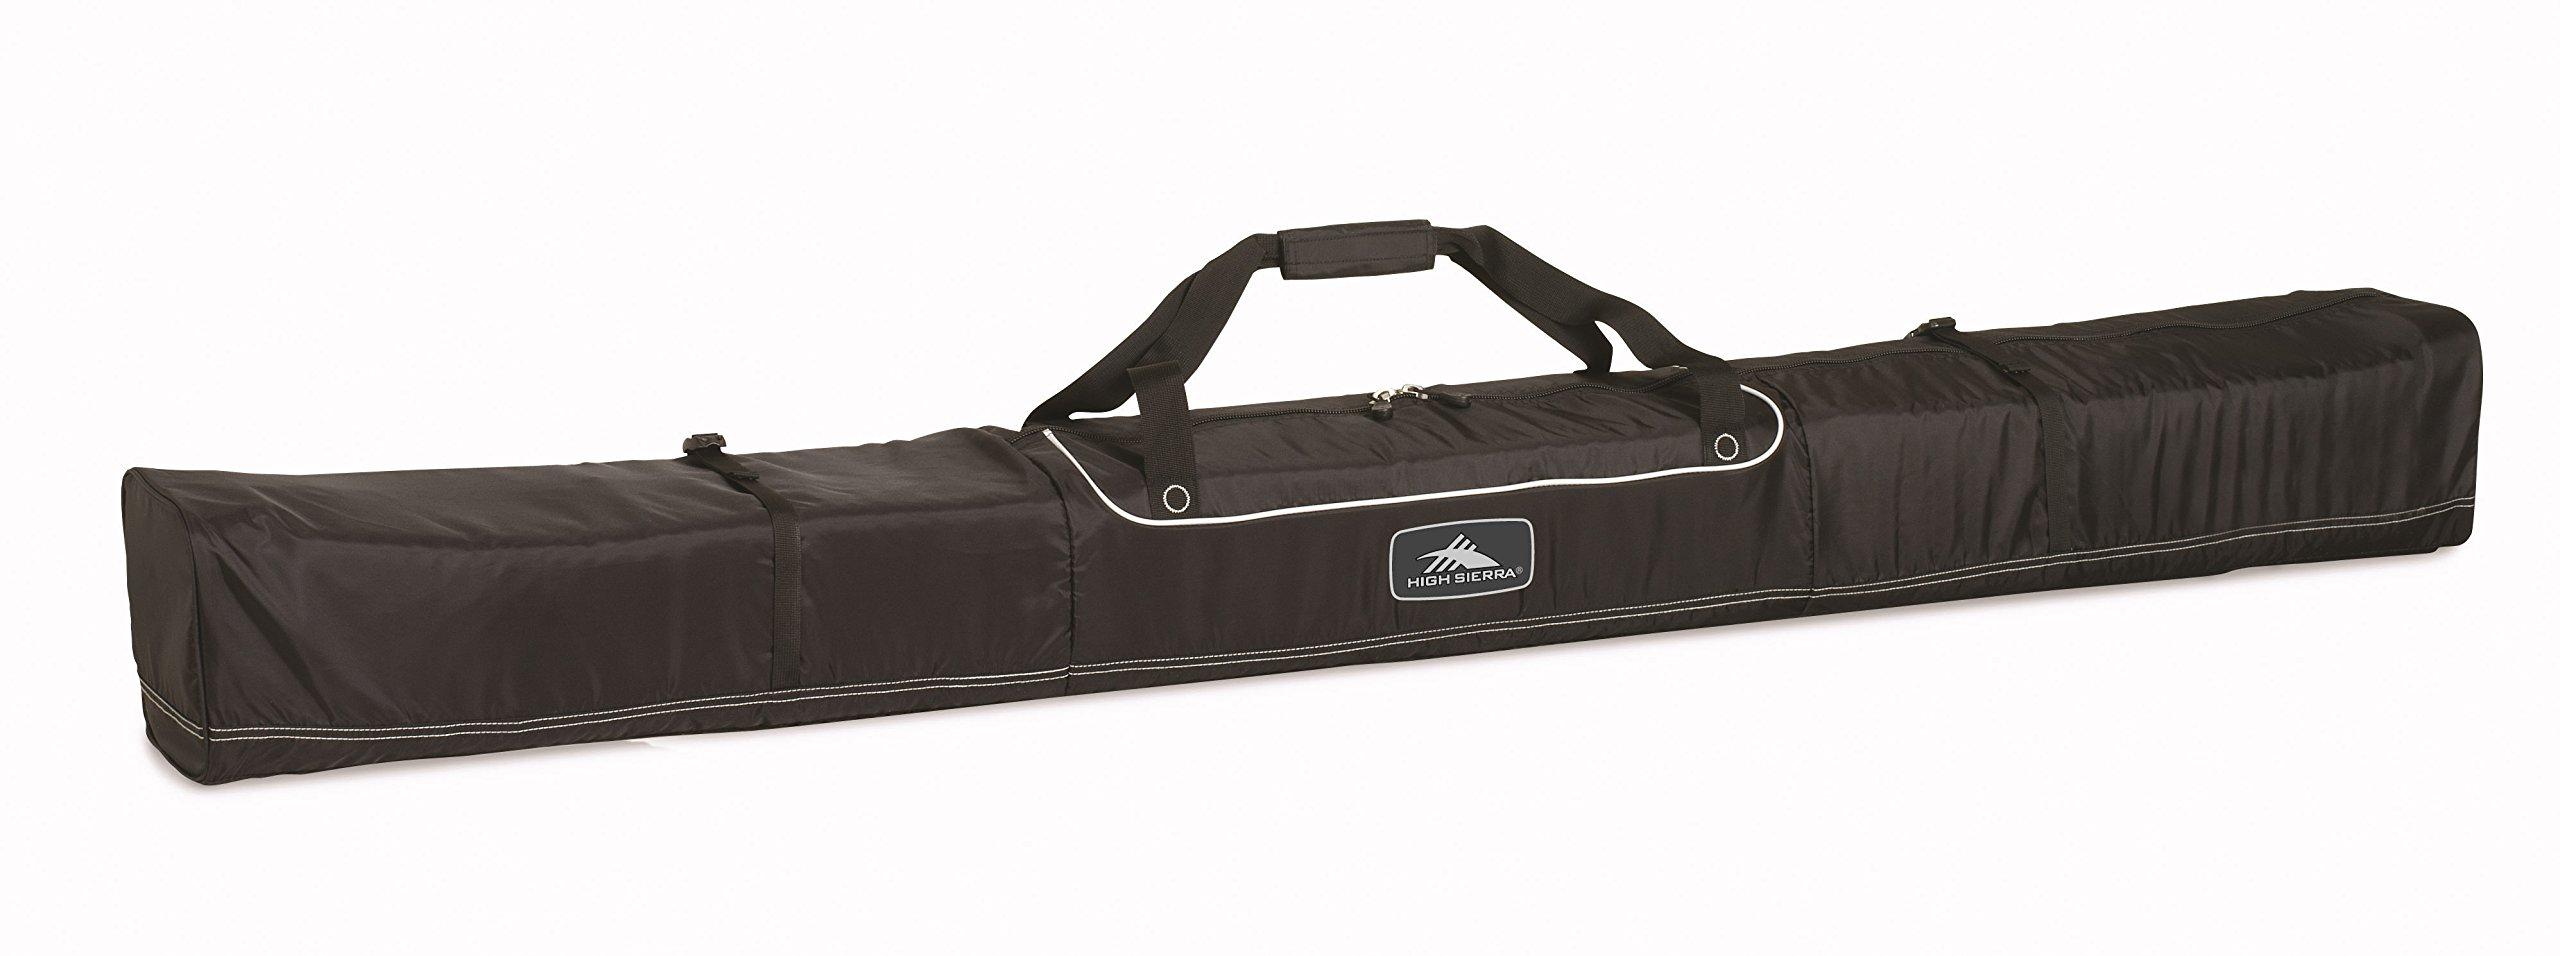 High Sierra Basic Ski Bag -Unpadded Ski Bag, Black - Large 185Cm by High Sierra